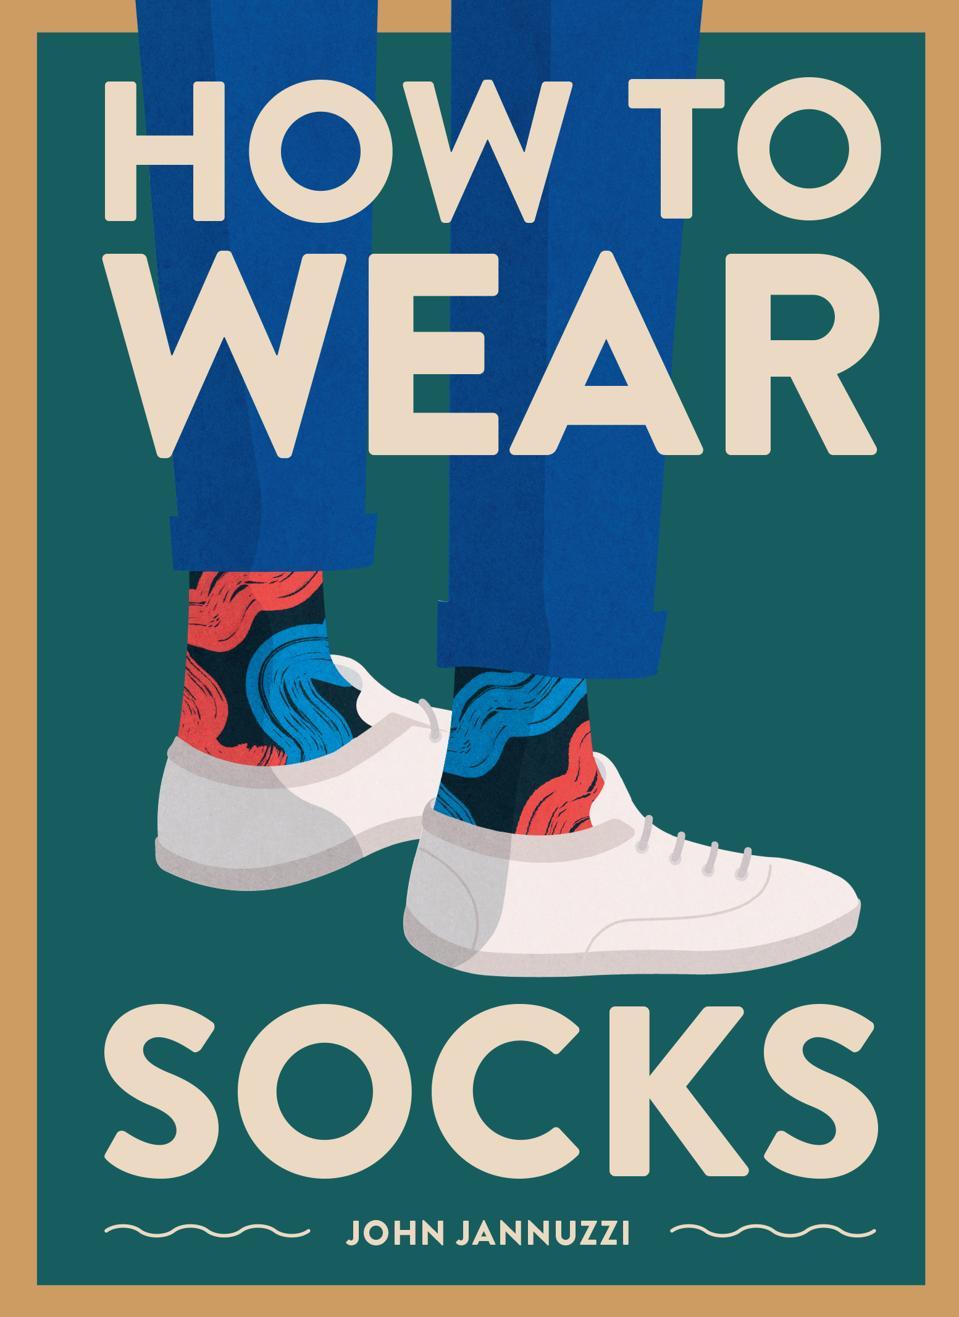 ″How to Wear Socks″ book